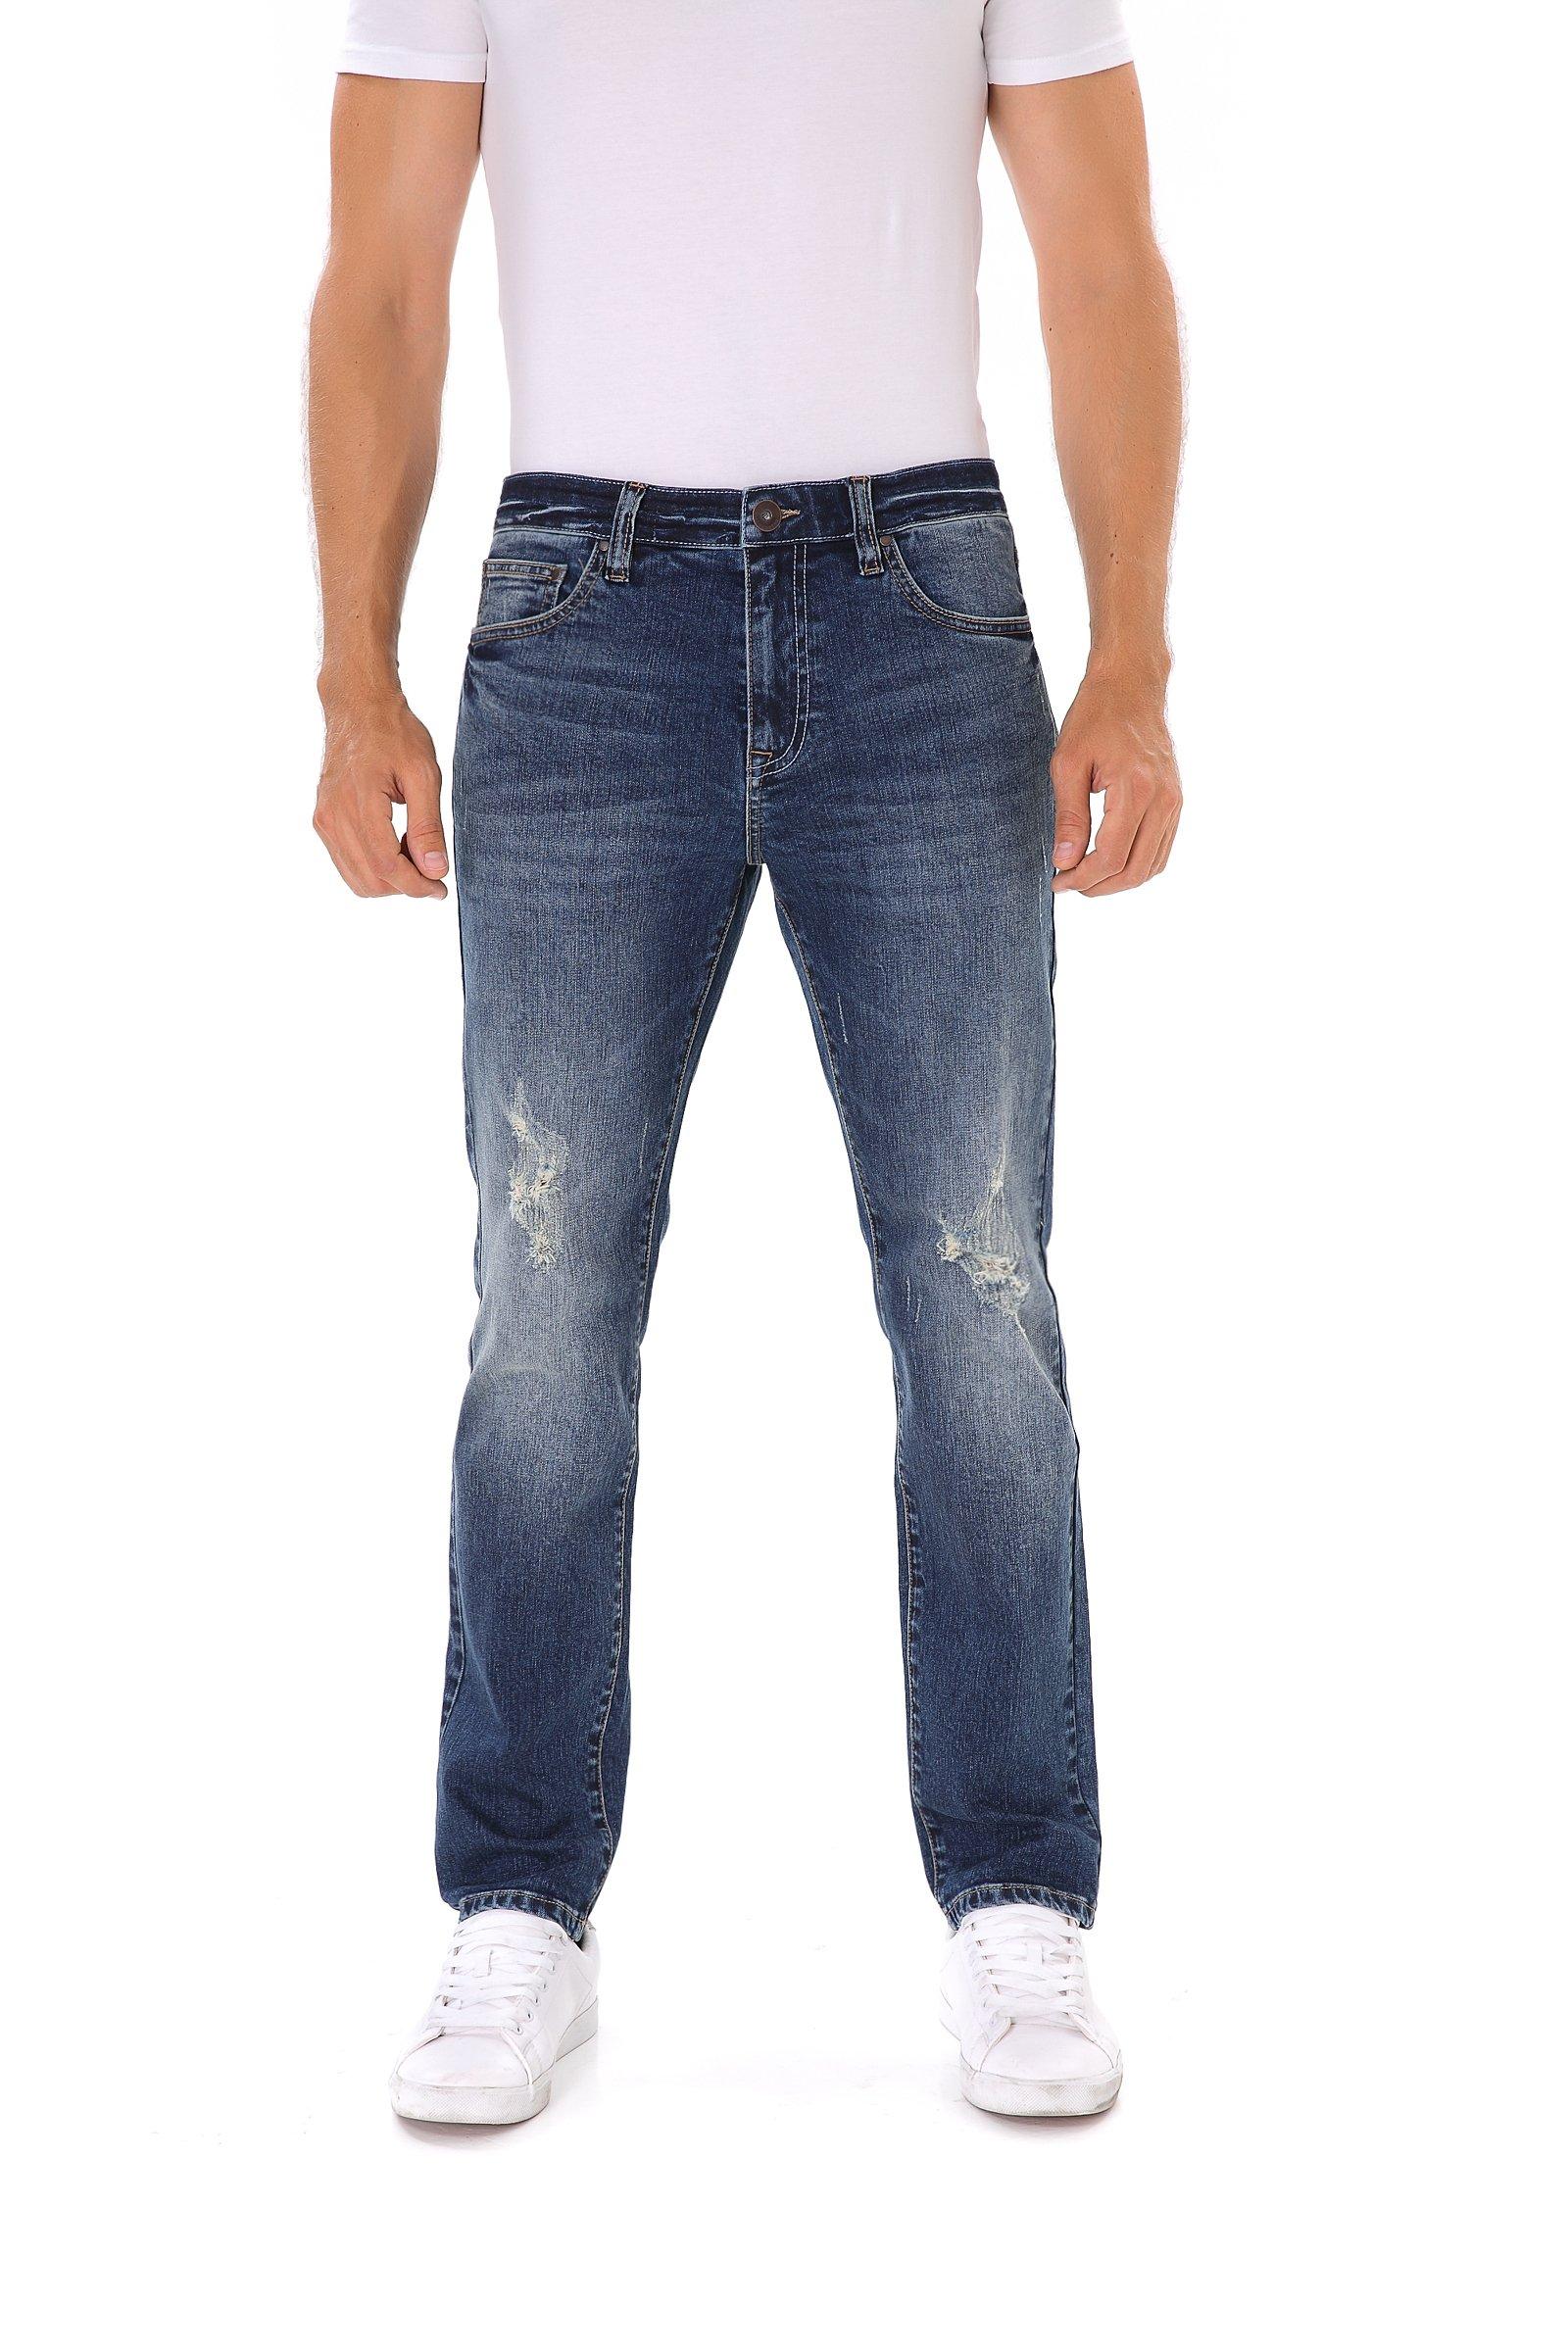 Indigo alpha Slim Fit Blue Ripped Distressed Destroyed Faded Stretchy Denim Jeans for Men (8017,W34/L30)